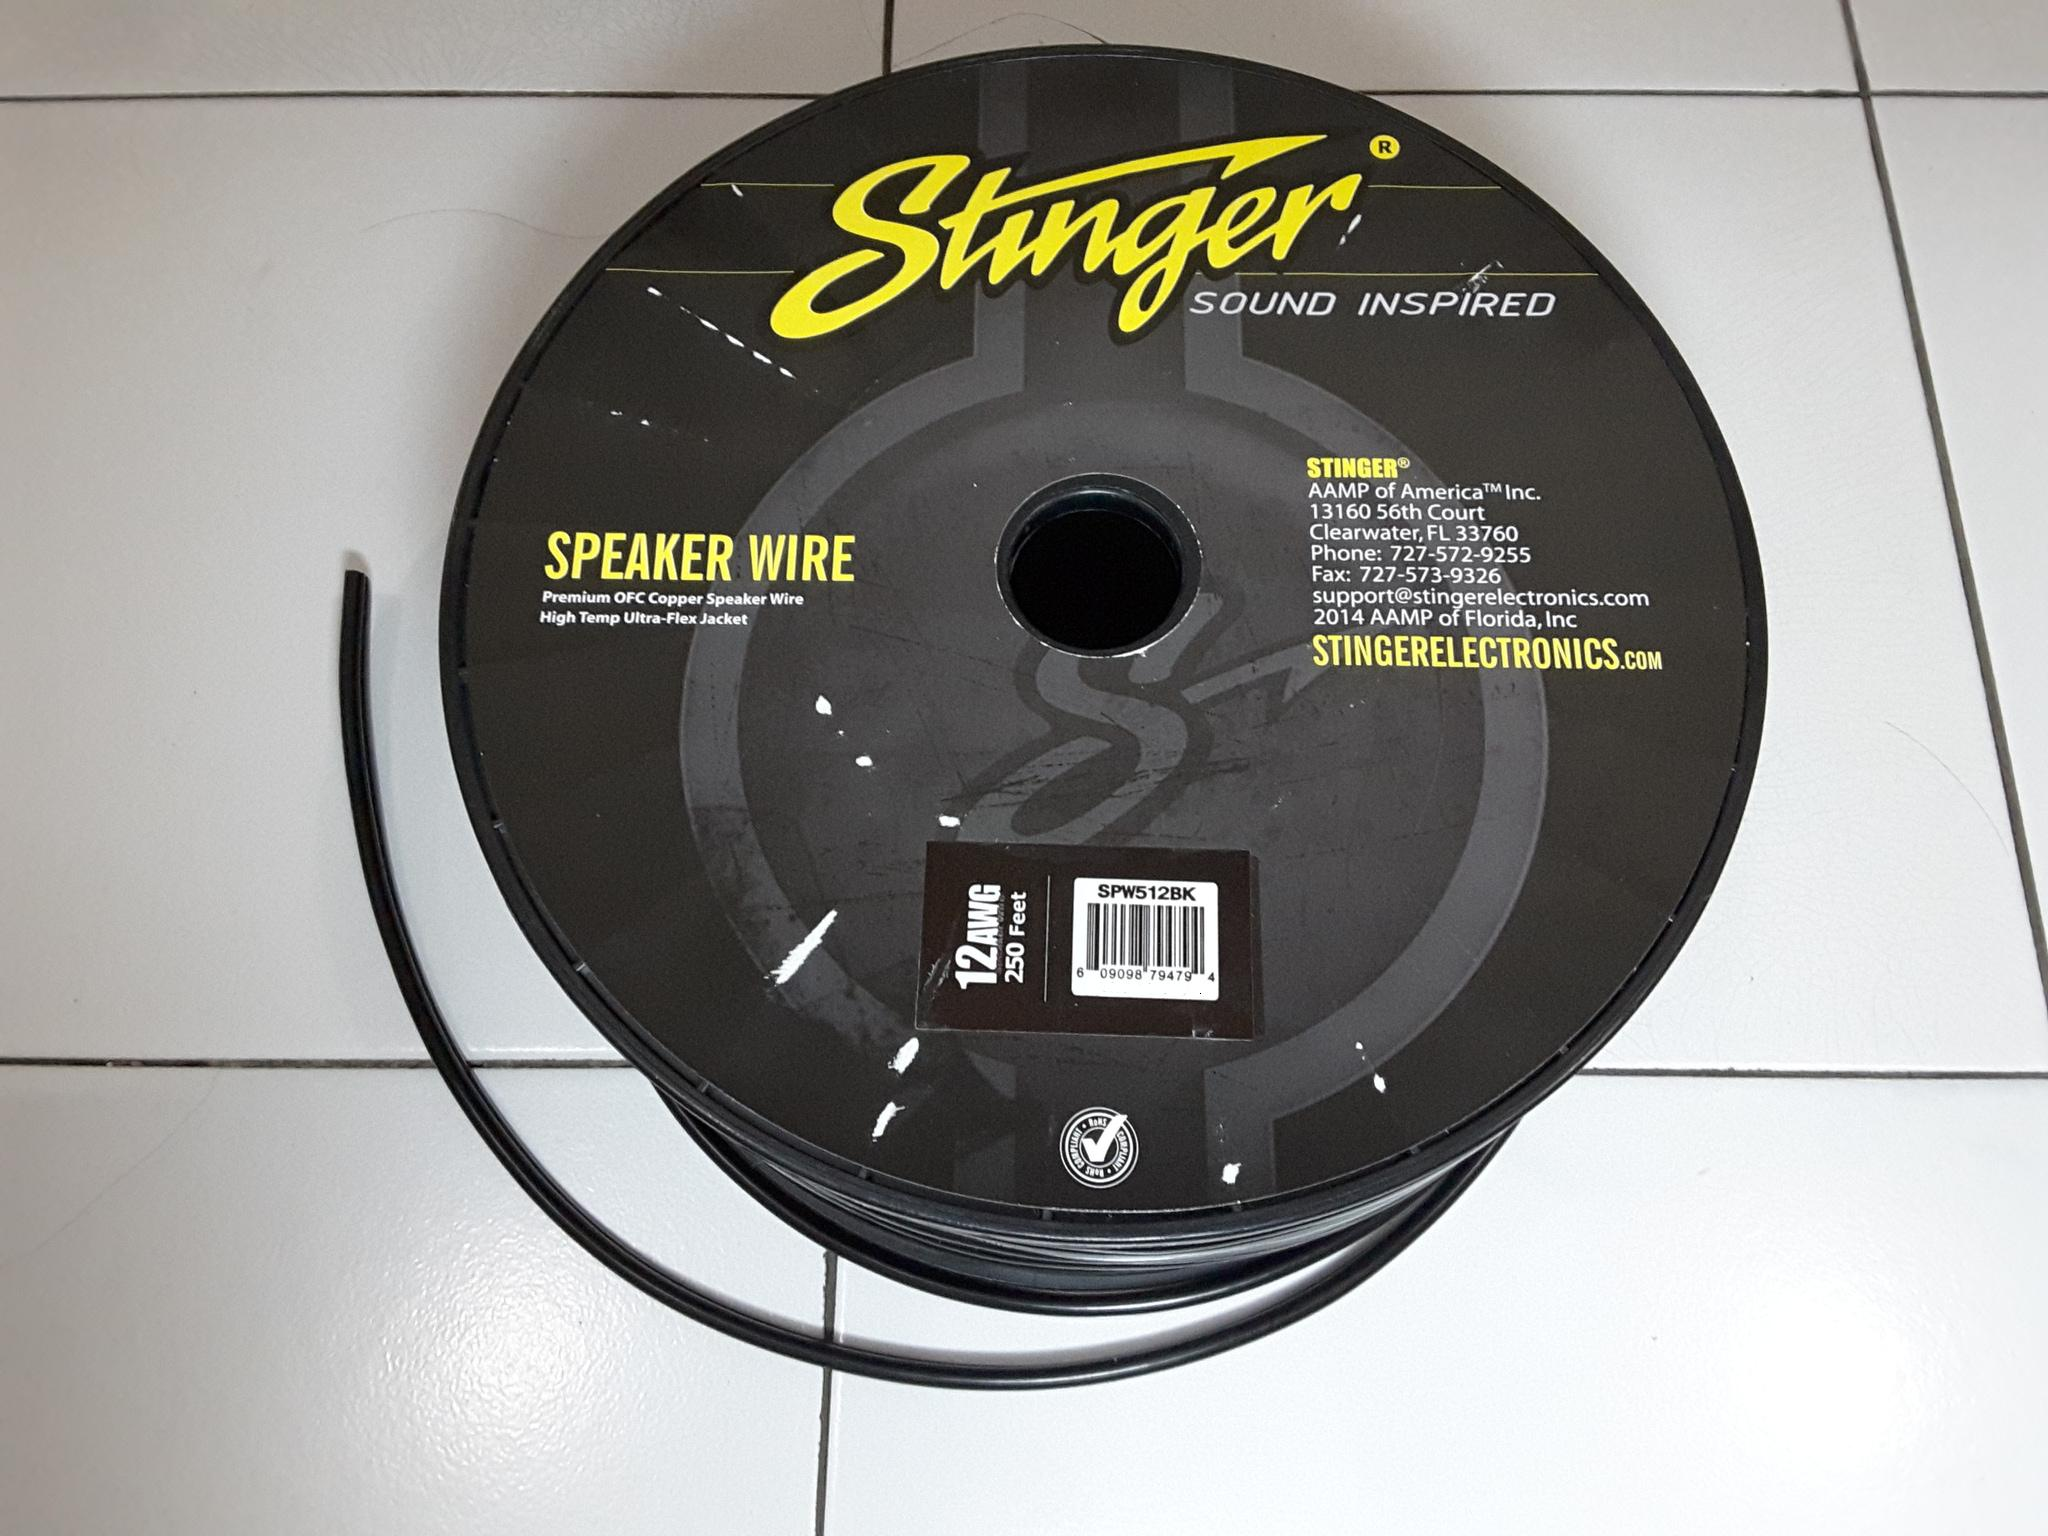 jual kabel speaker 12 awg stinger pro series kota surabaya alexander accs tokopedia. Black Bedroom Furniture Sets. Home Design Ideas